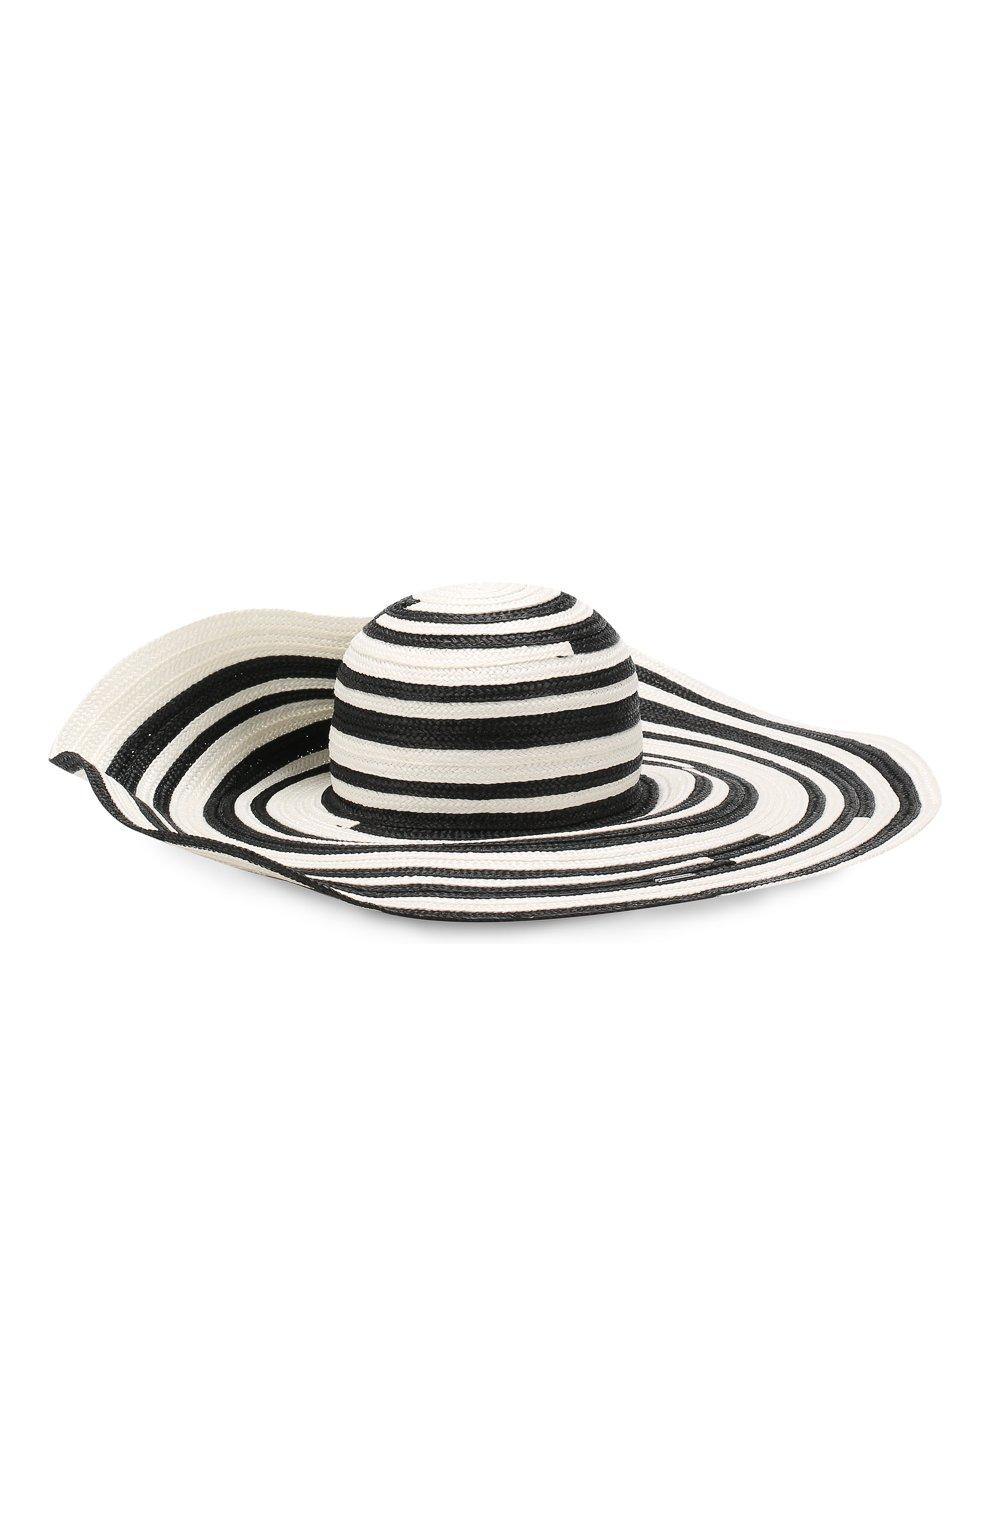 Шляпа из вискозы | Фото №2